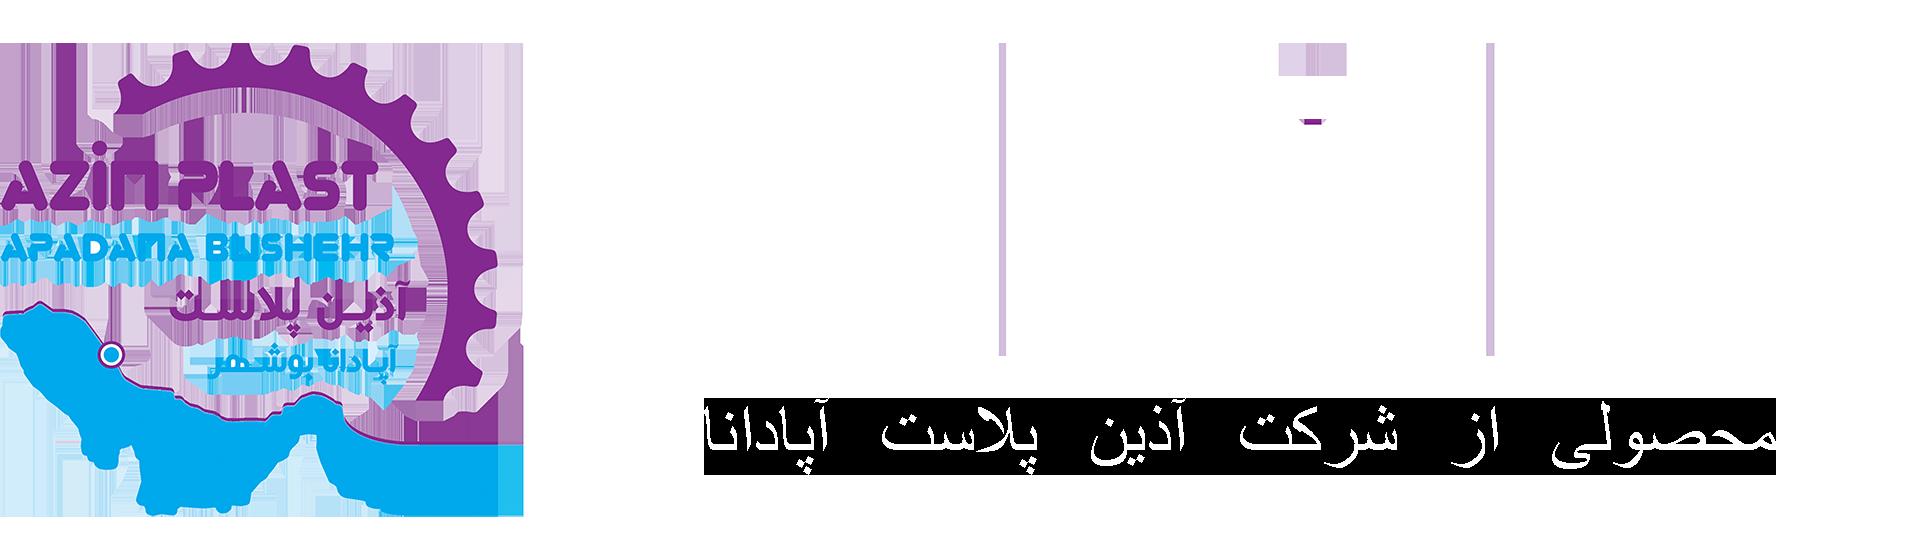 کارتن پلاست بوشهر